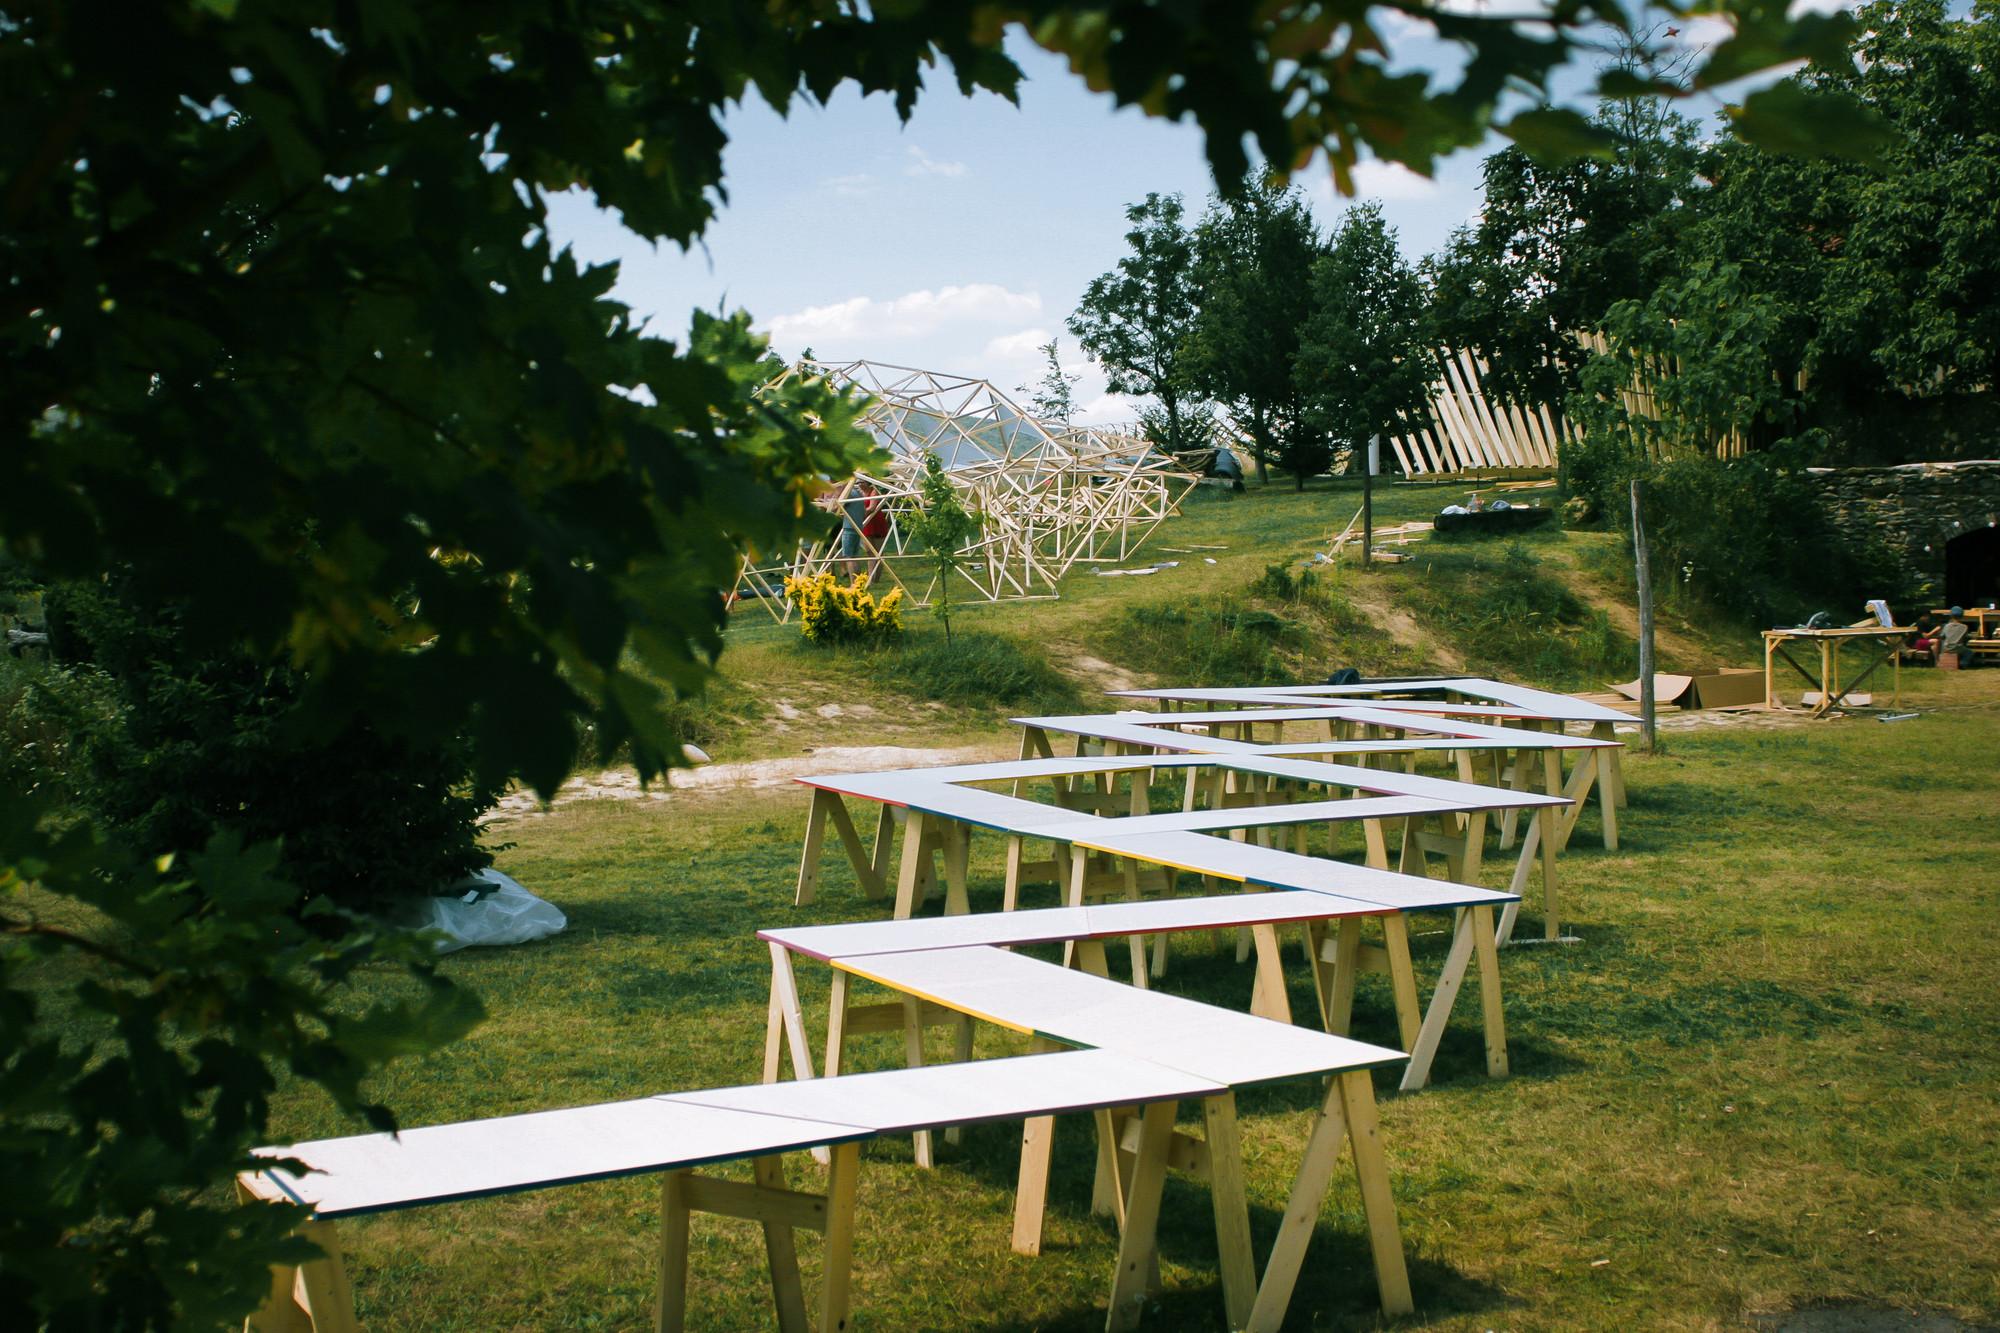 /Table/. Image © Somoskői Gábor